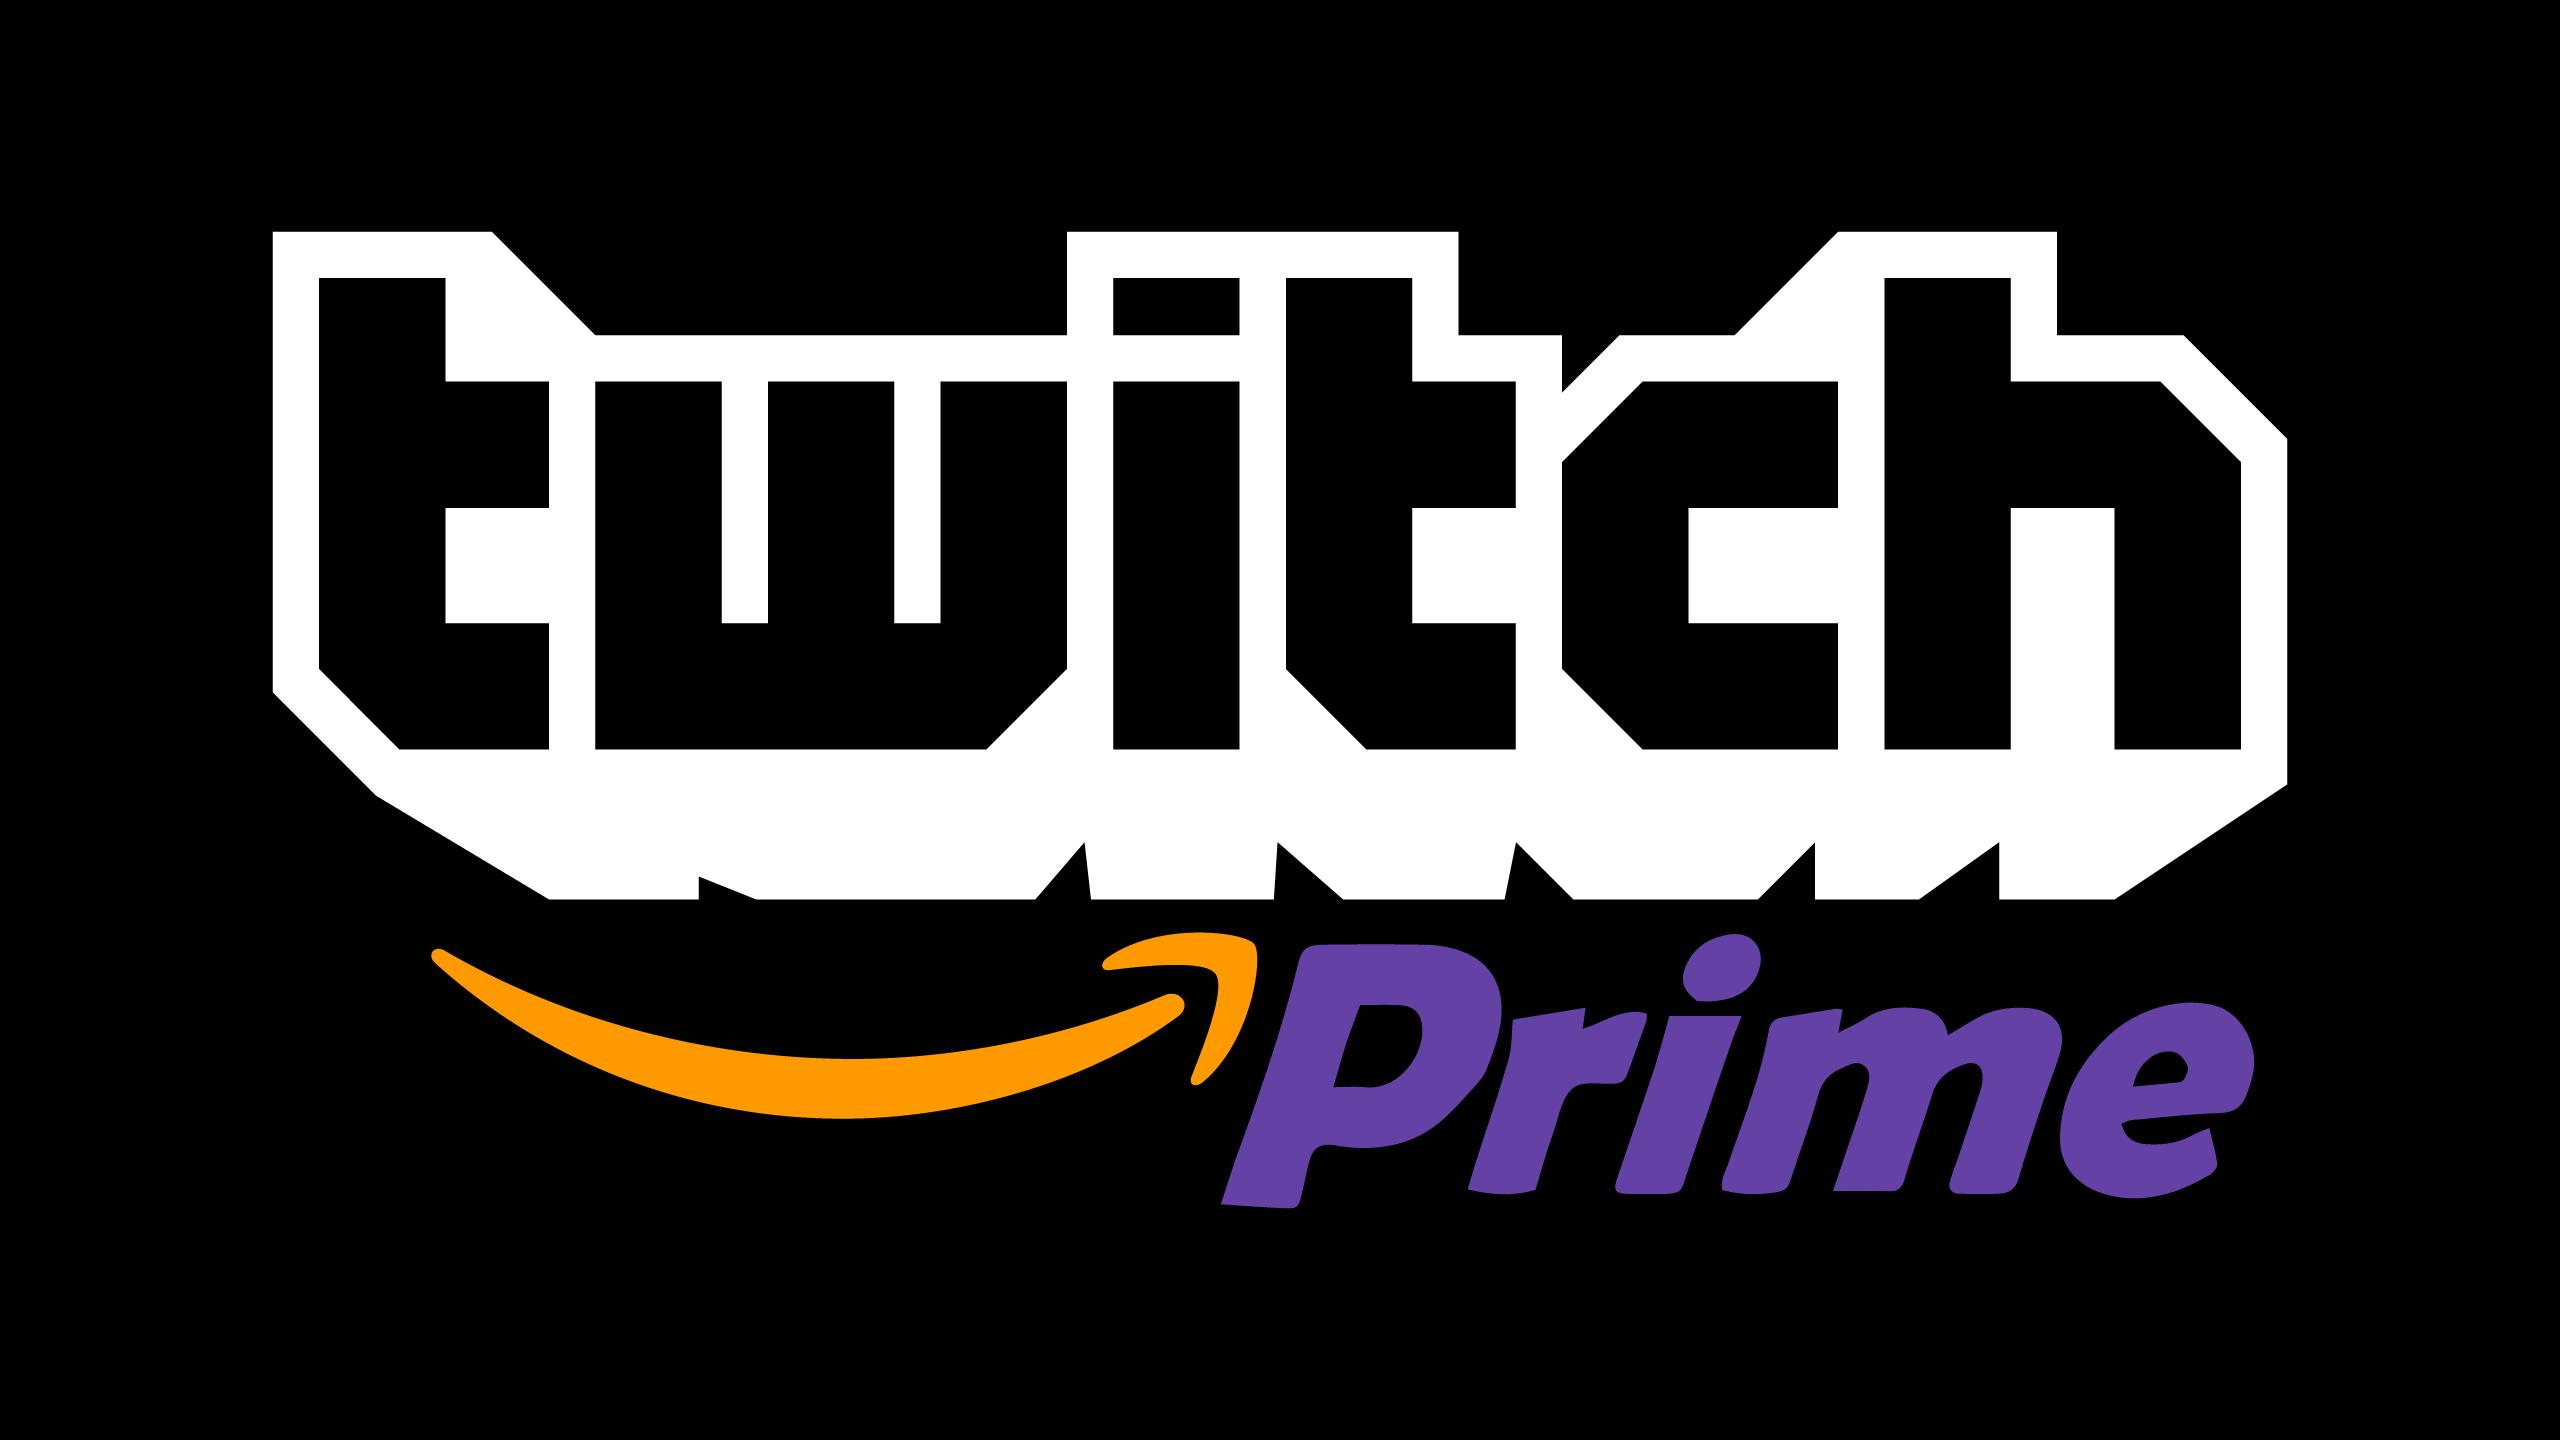 World of Tanks: Набор Эхо + twitch prime